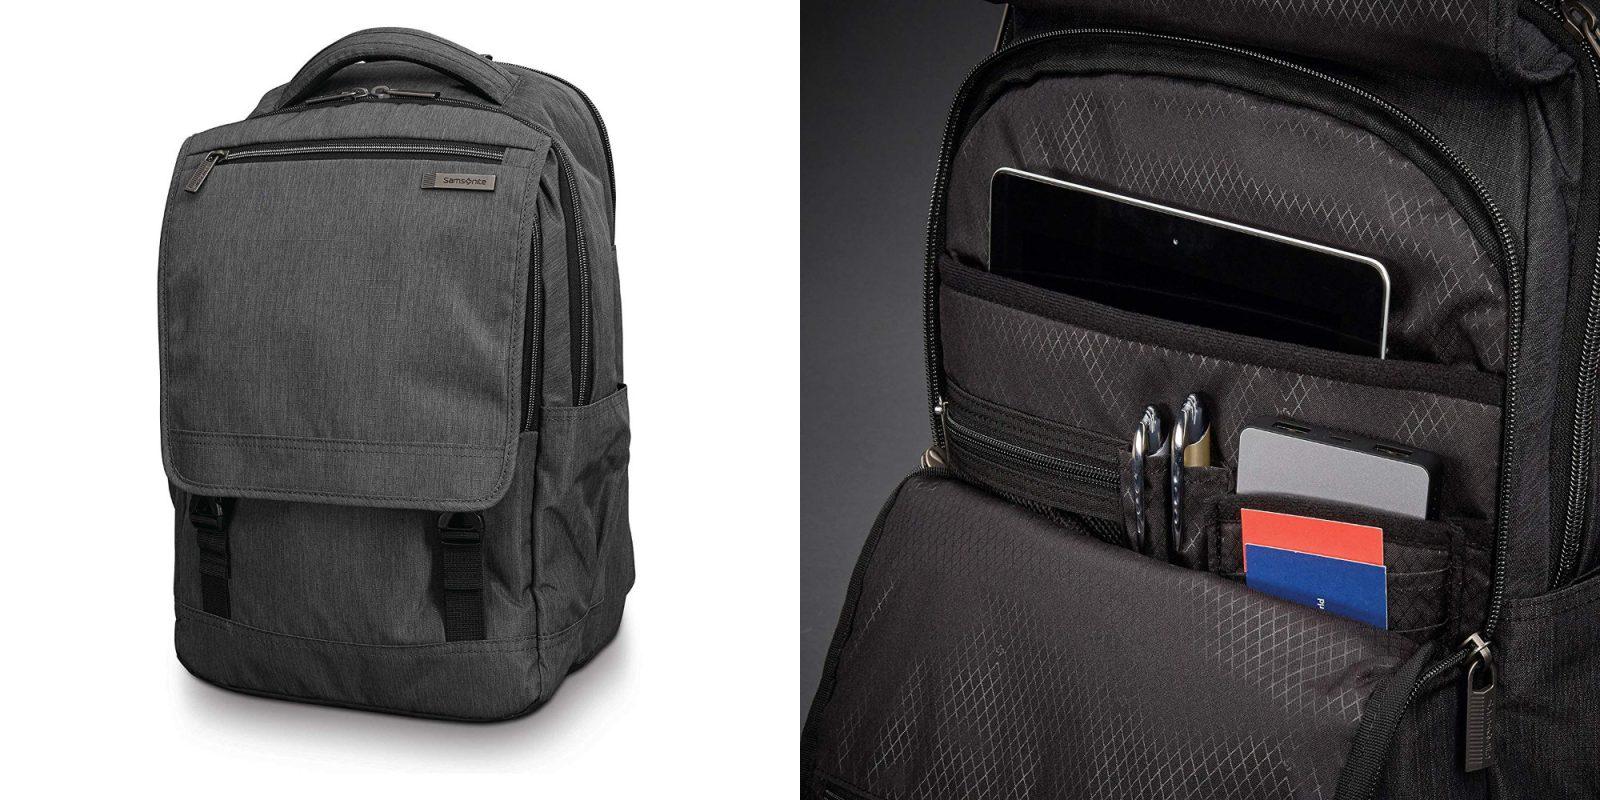 Stow an iPad + MacBook in Samsonite's Modern Paracycle Backpack: $63 (30% off)